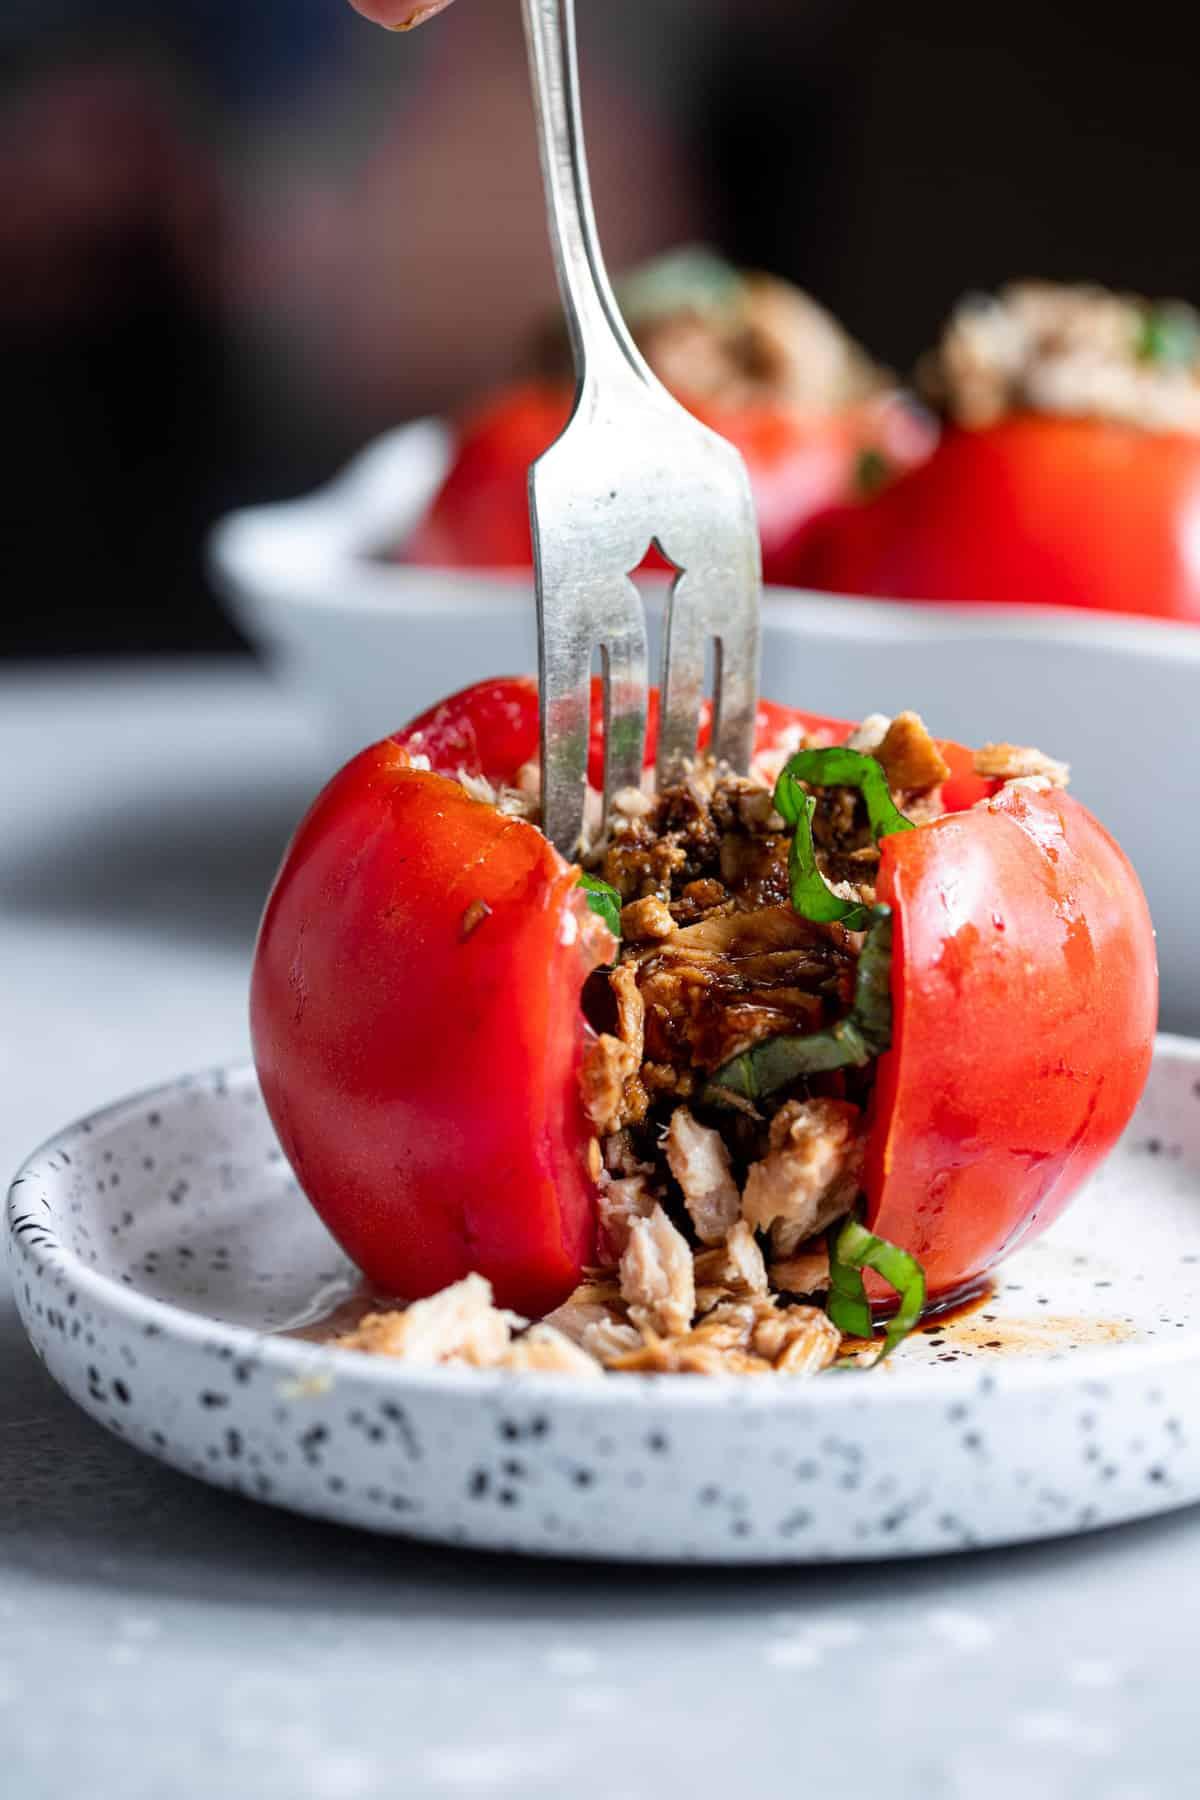 a fork cutting into tuna stuffed tomatoes